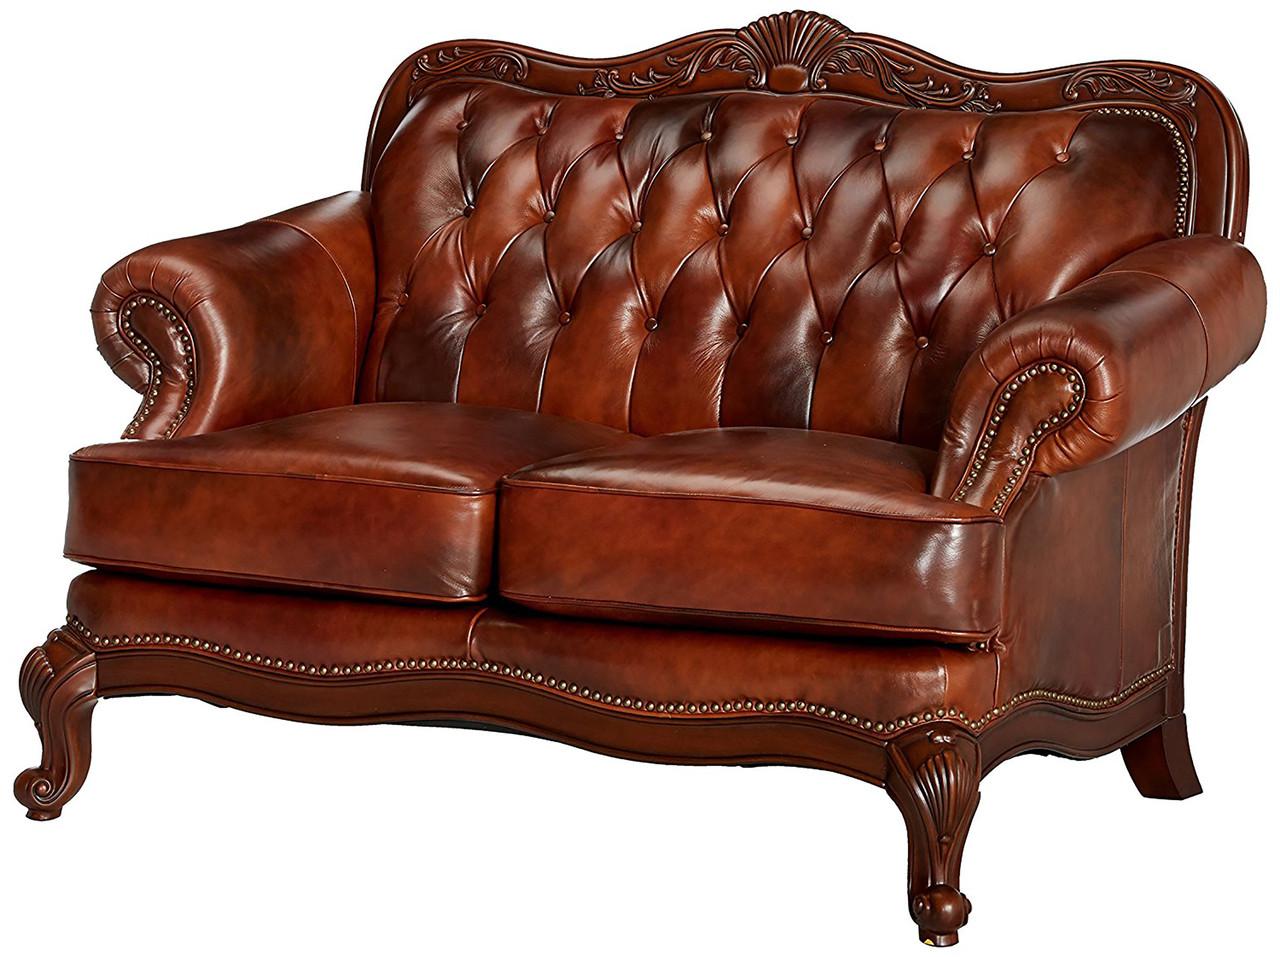 Fantastic Gordon Top Grain Leather Loveseat Bralicious Painted Fabric Chair Ideas Braliciousco